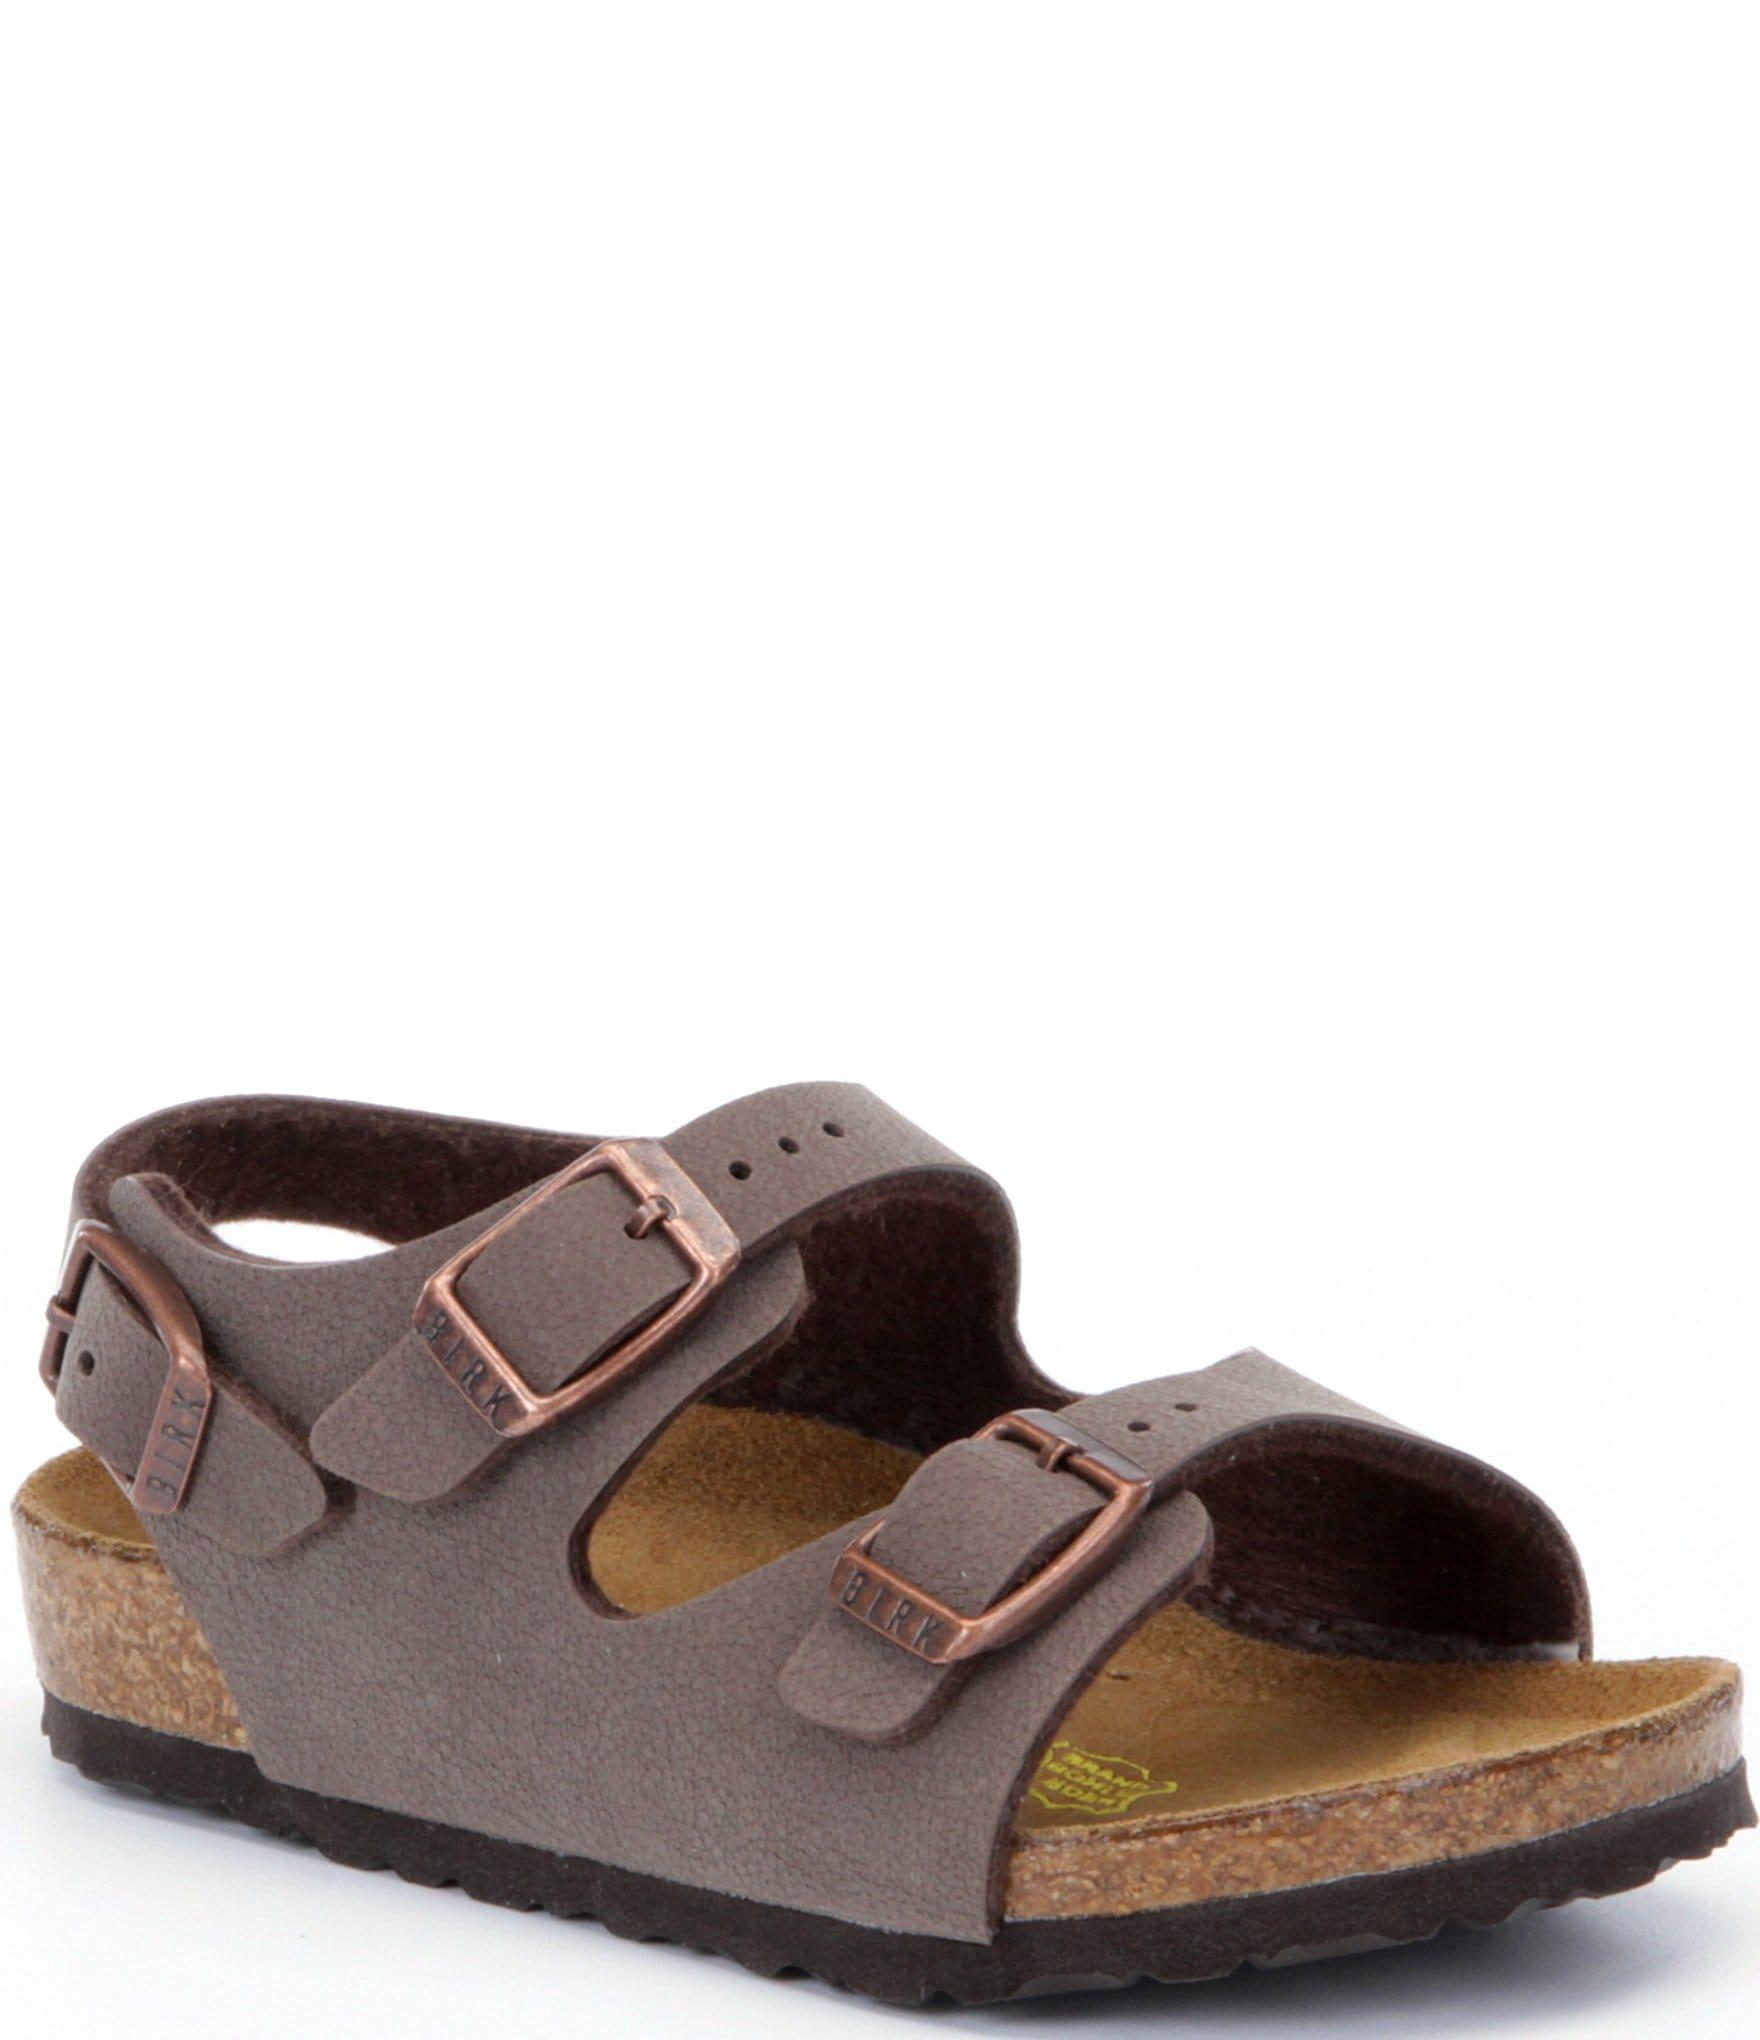 Boys' Slingback Birkenstock Sandals Adjustable Buckle Roma l15Fc3uJKT